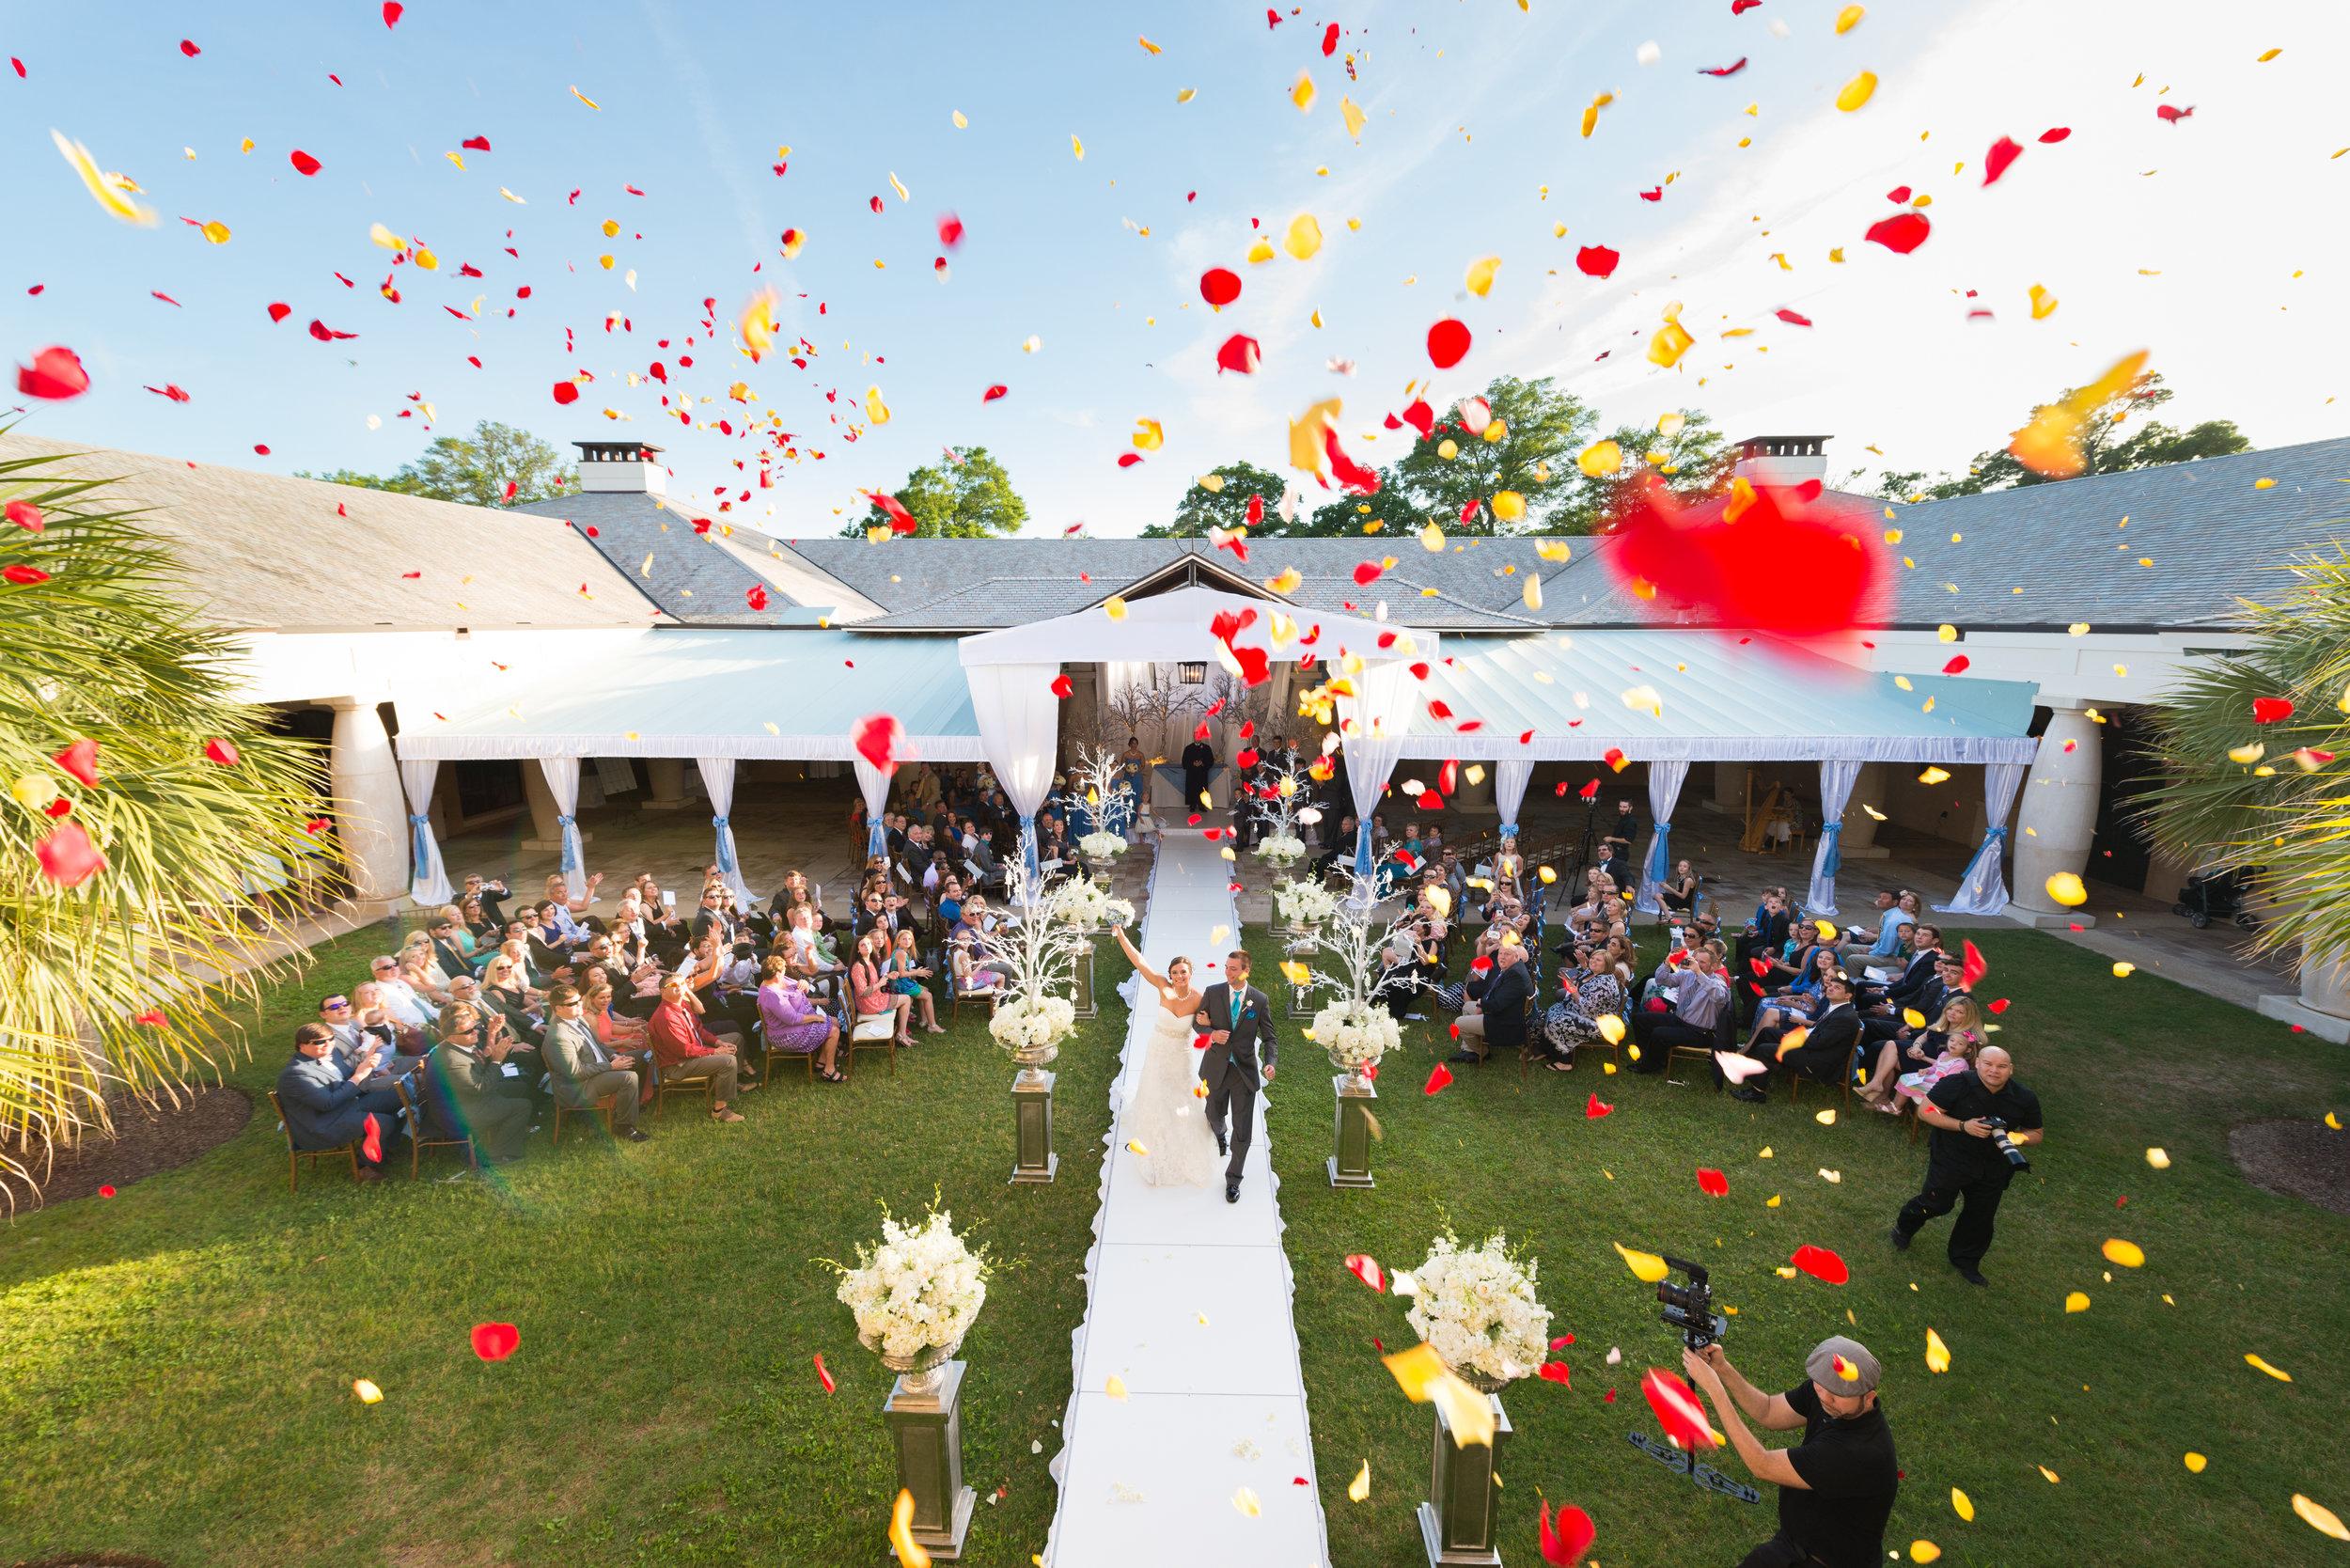 Carl-Kerridge-Photography-North-Beach-Wedding-May-2015-140.jpg